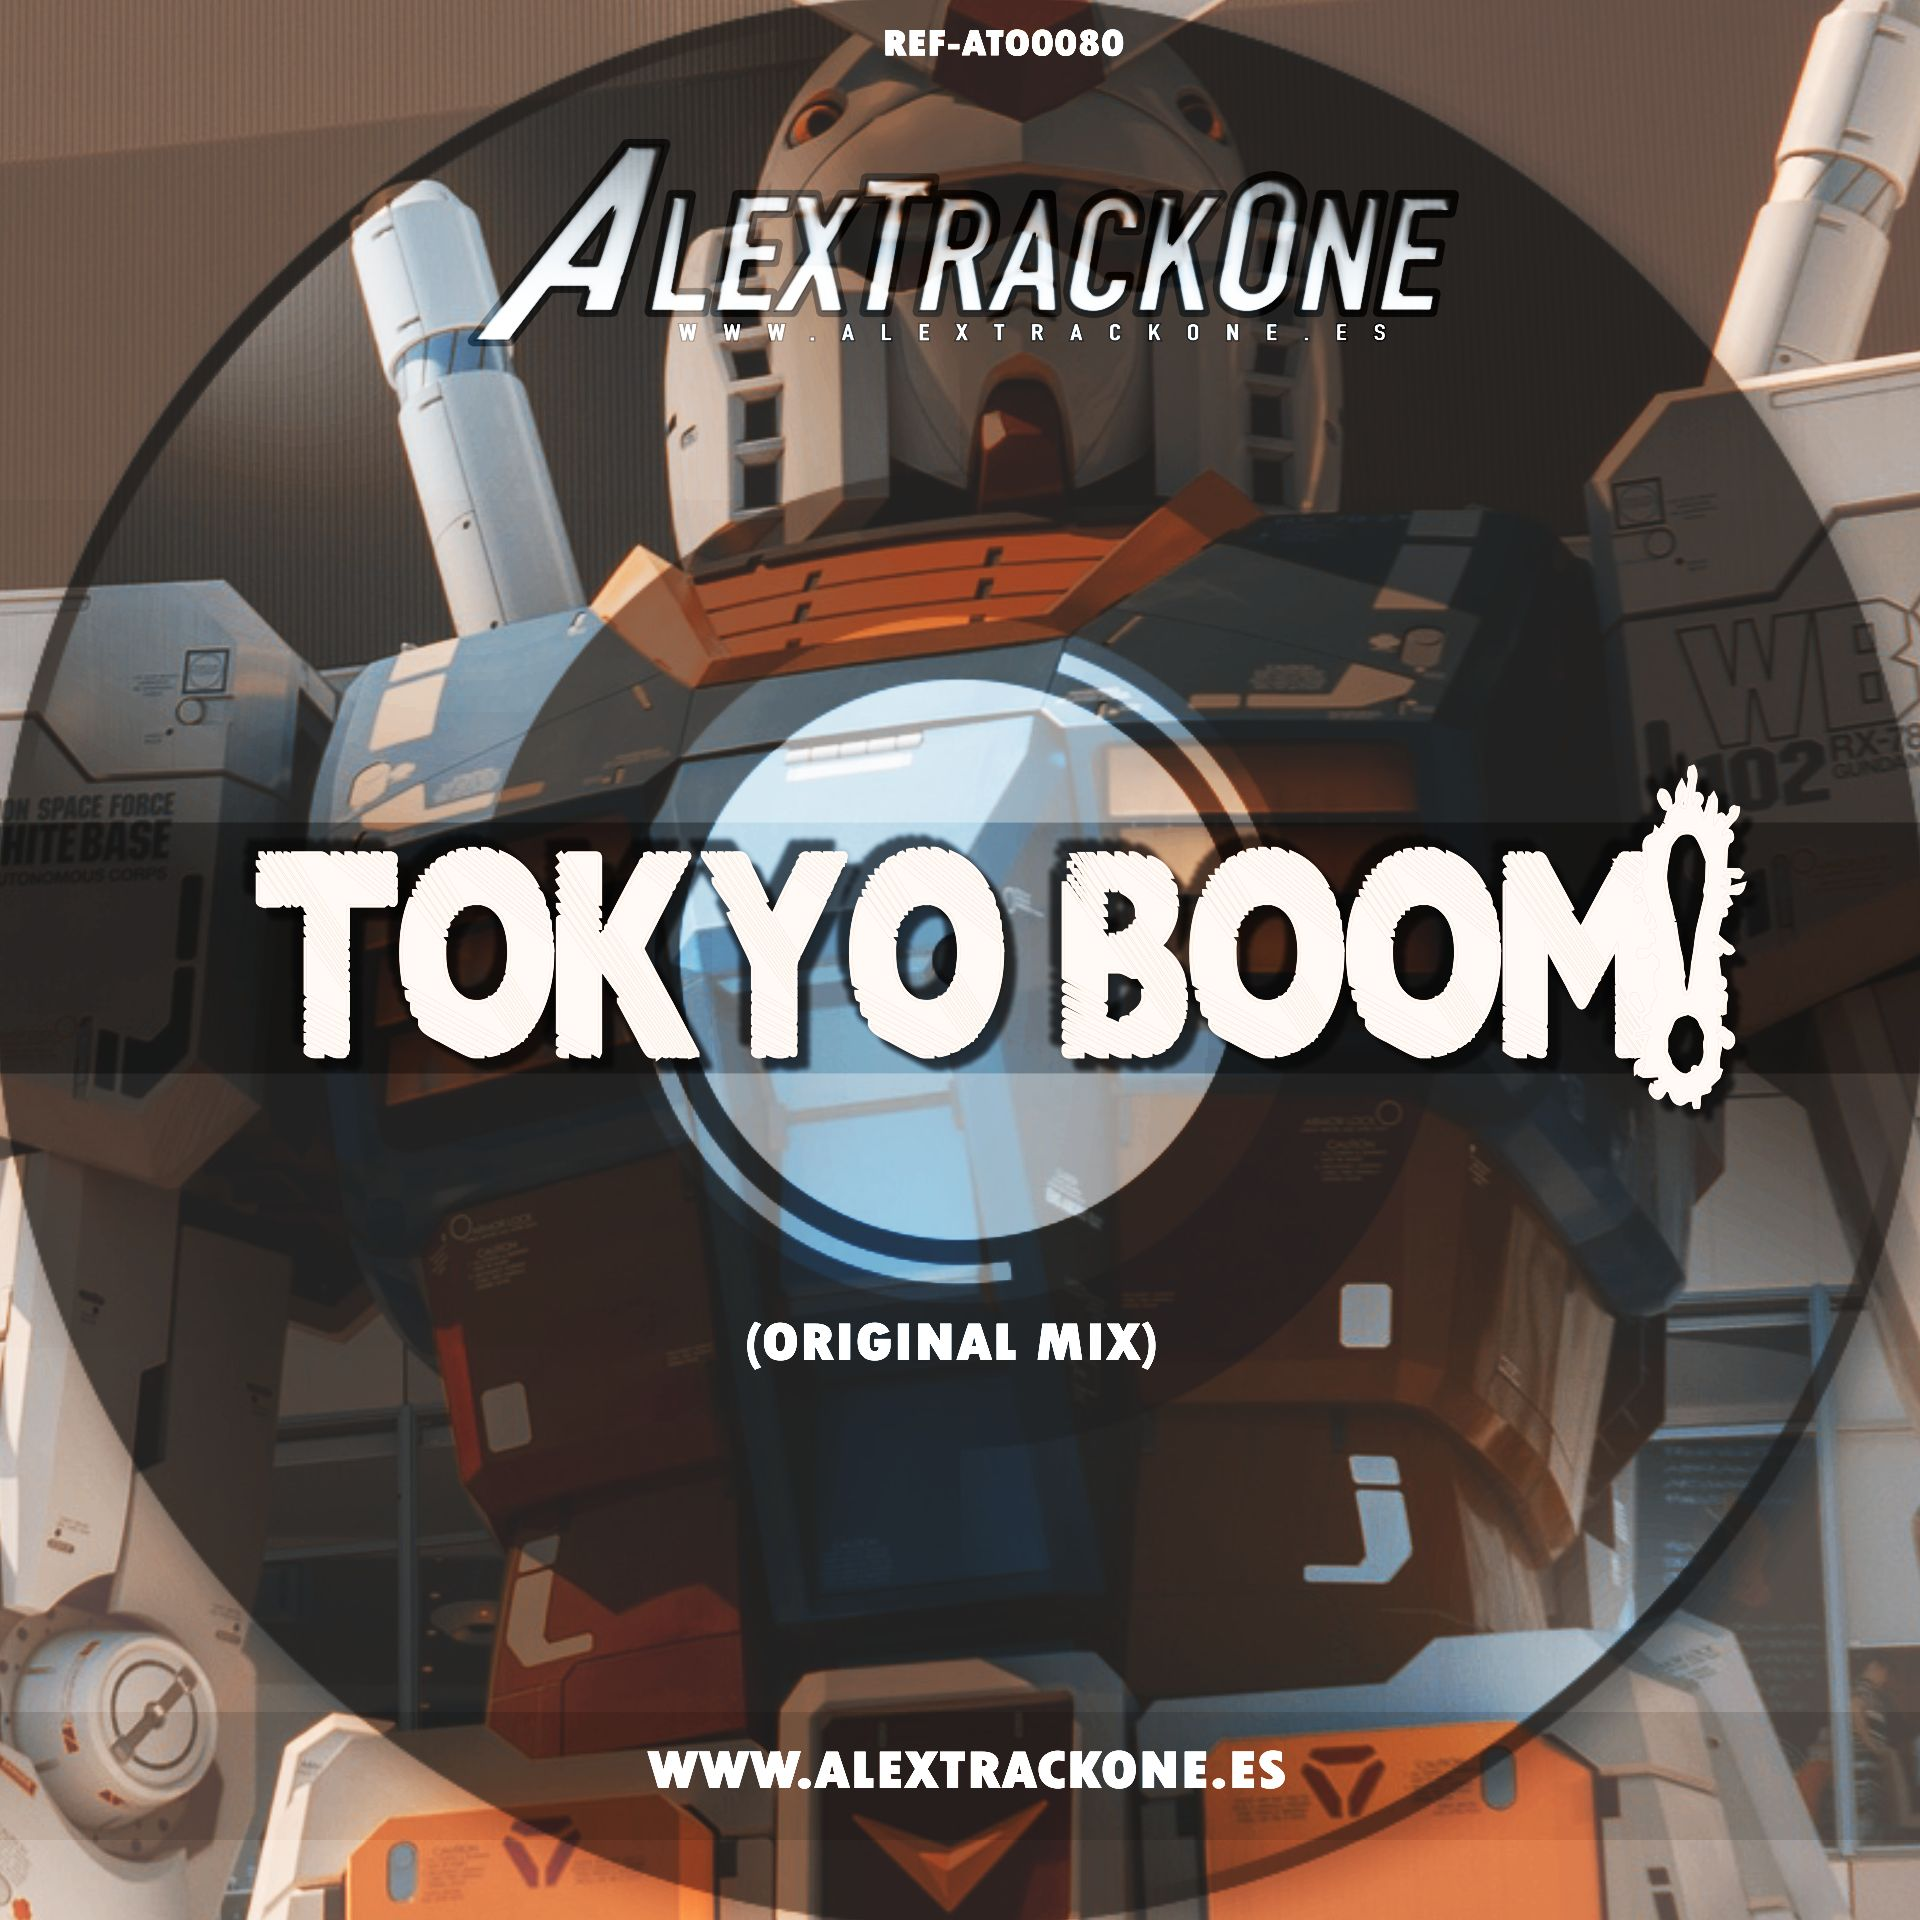 REF-ATO0080 TOKYO BOOM (ORIGINAL MIX) (MP3 & WAV & FLAC)